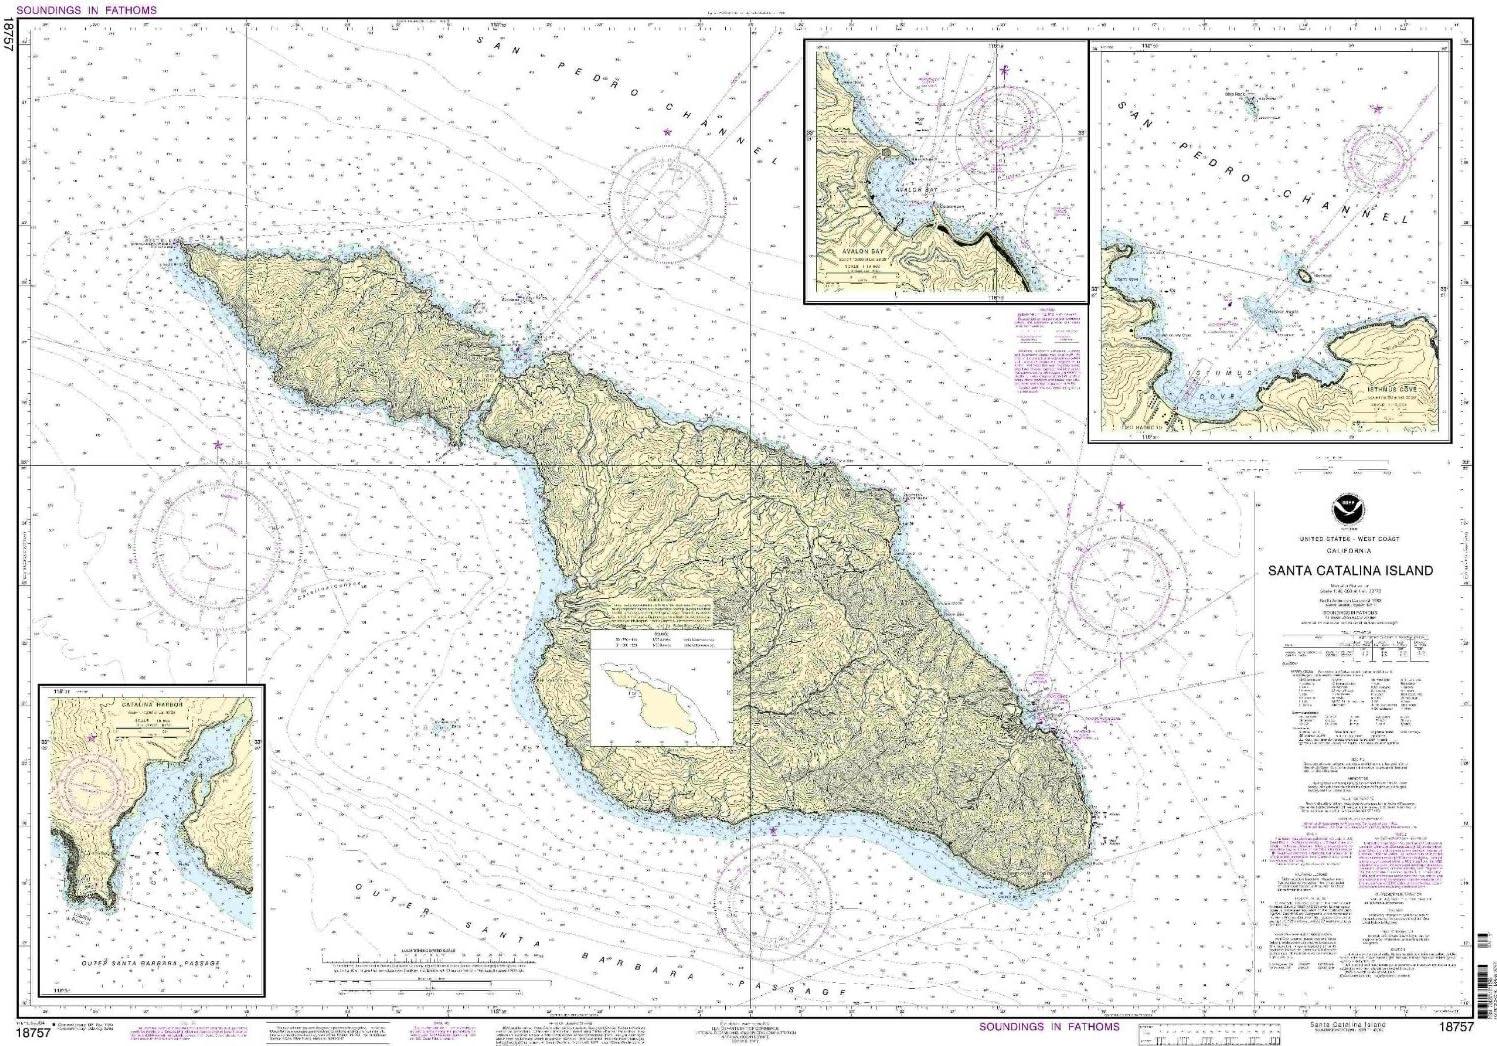 NOAA 18757-Santa Catalina Island Avalon Manufacturer OFFicial shop I Bombing new work Bay Harbor